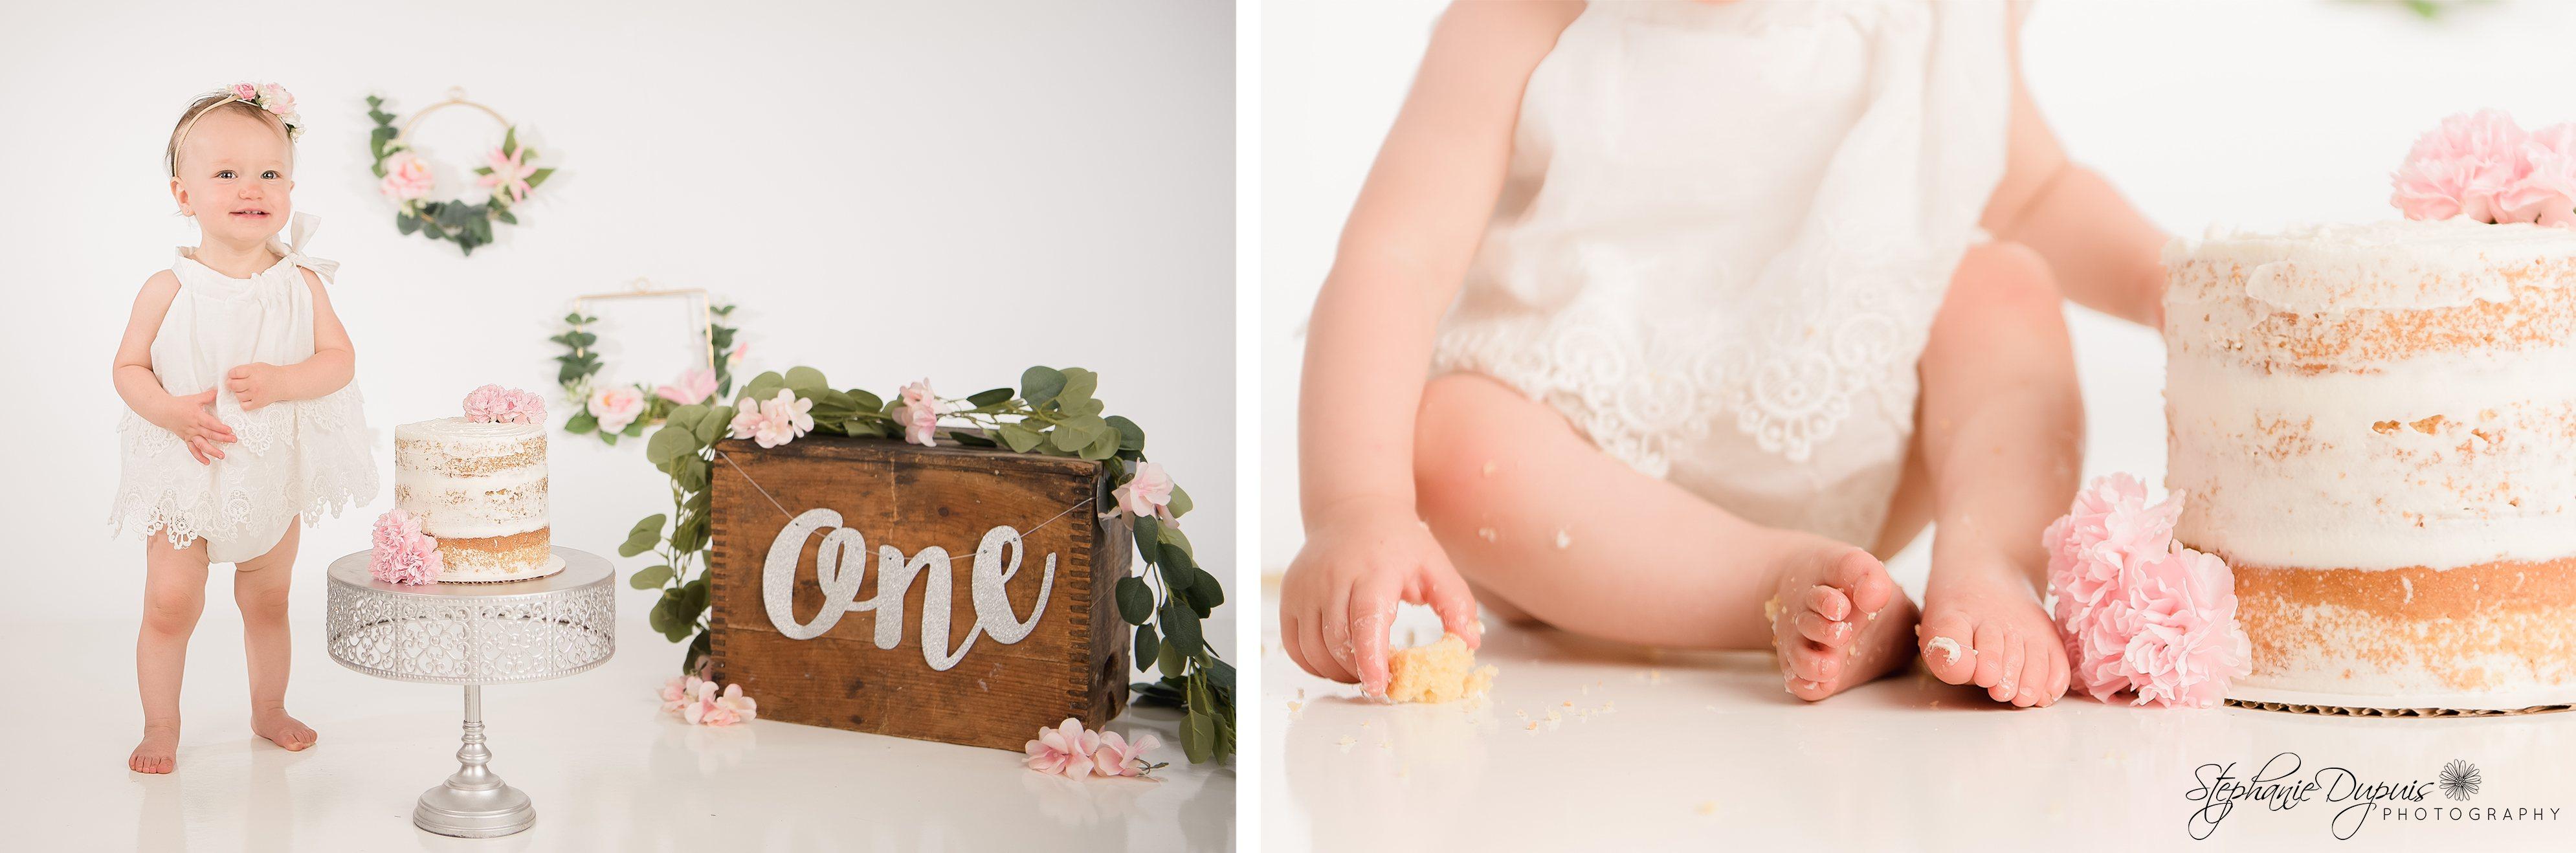 Kelly Jo Double Landscape 3 - Portfolio: Kelly Jo Infant Session